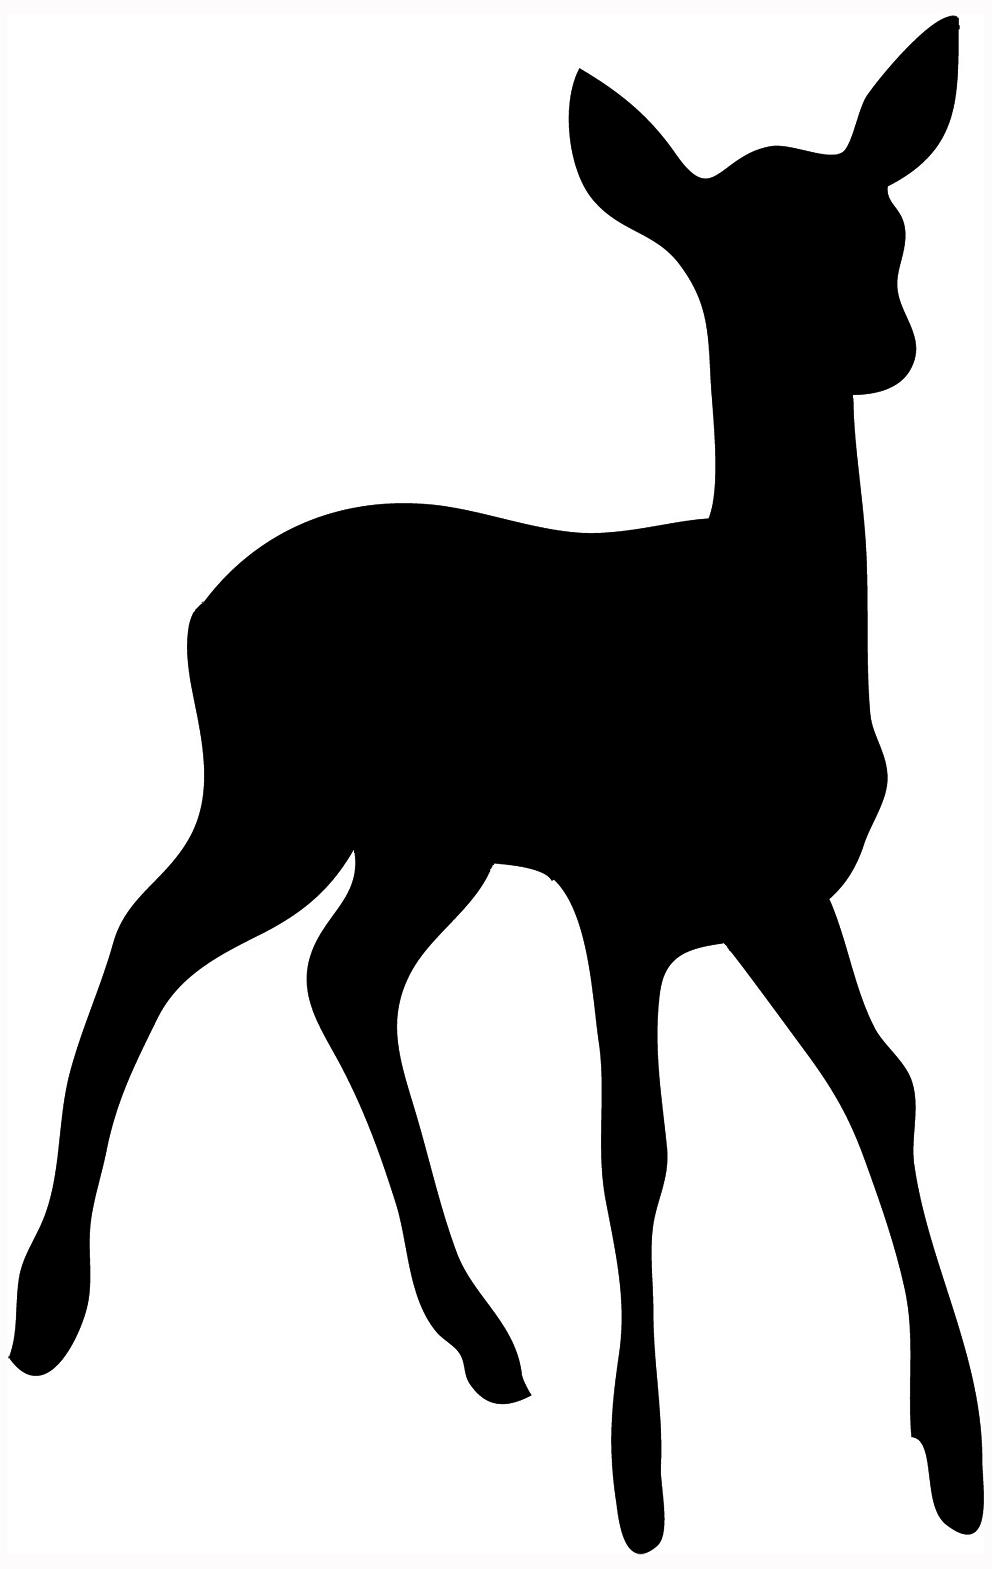 animal silhouette silhouette clip art rh clipartqueen com silhouette clip art people silhouette clip art free images